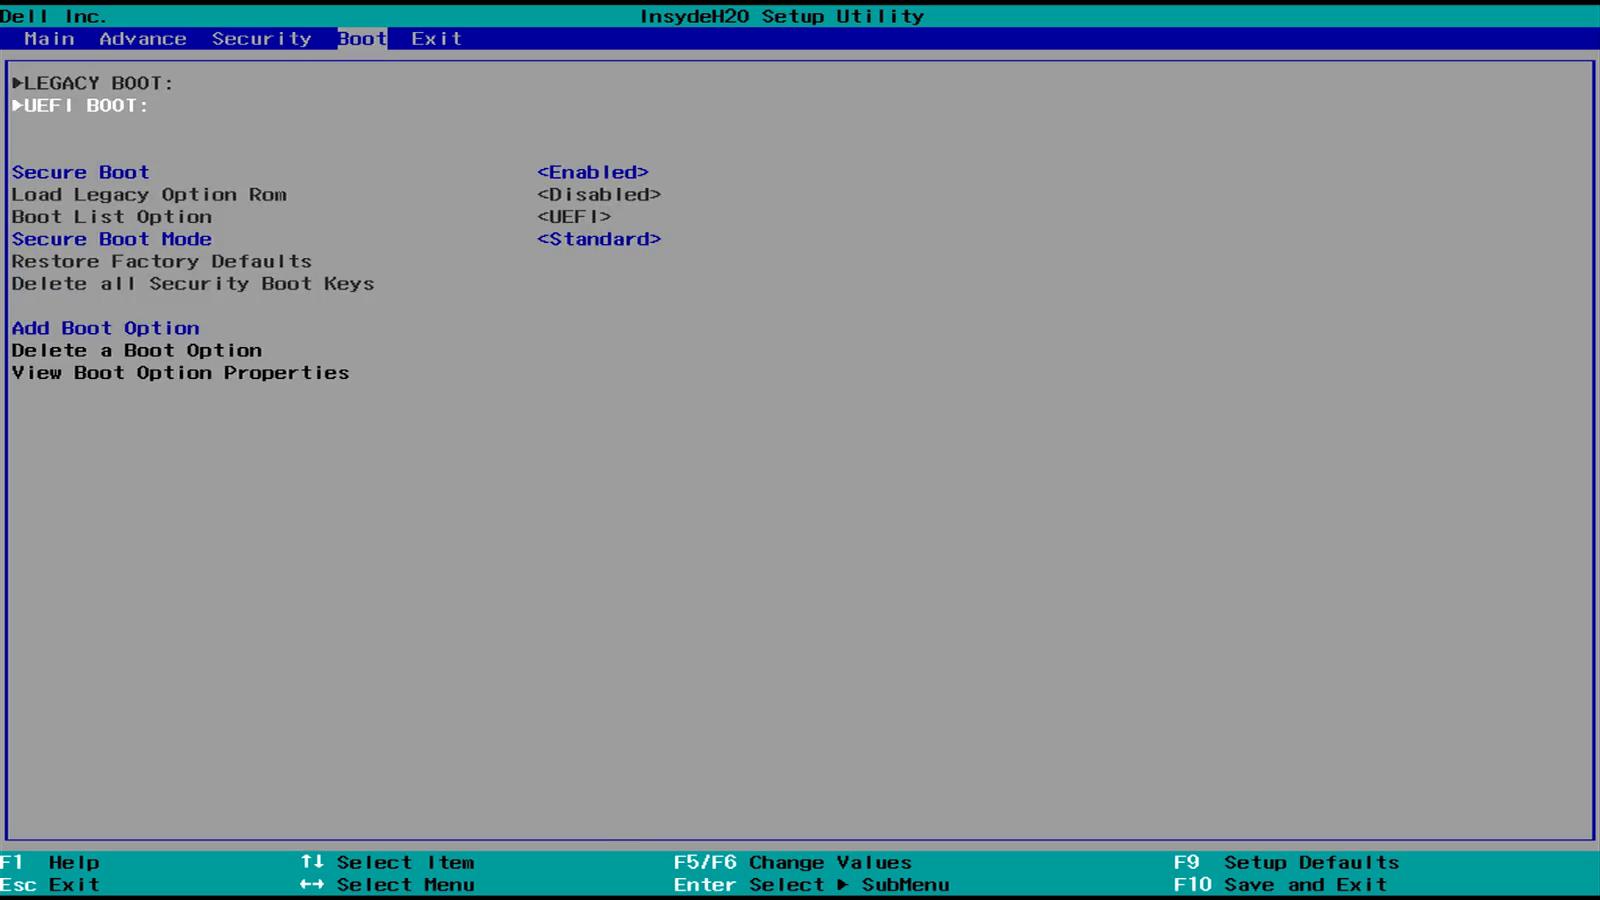 windows 8.1 uefi firmware settings missing